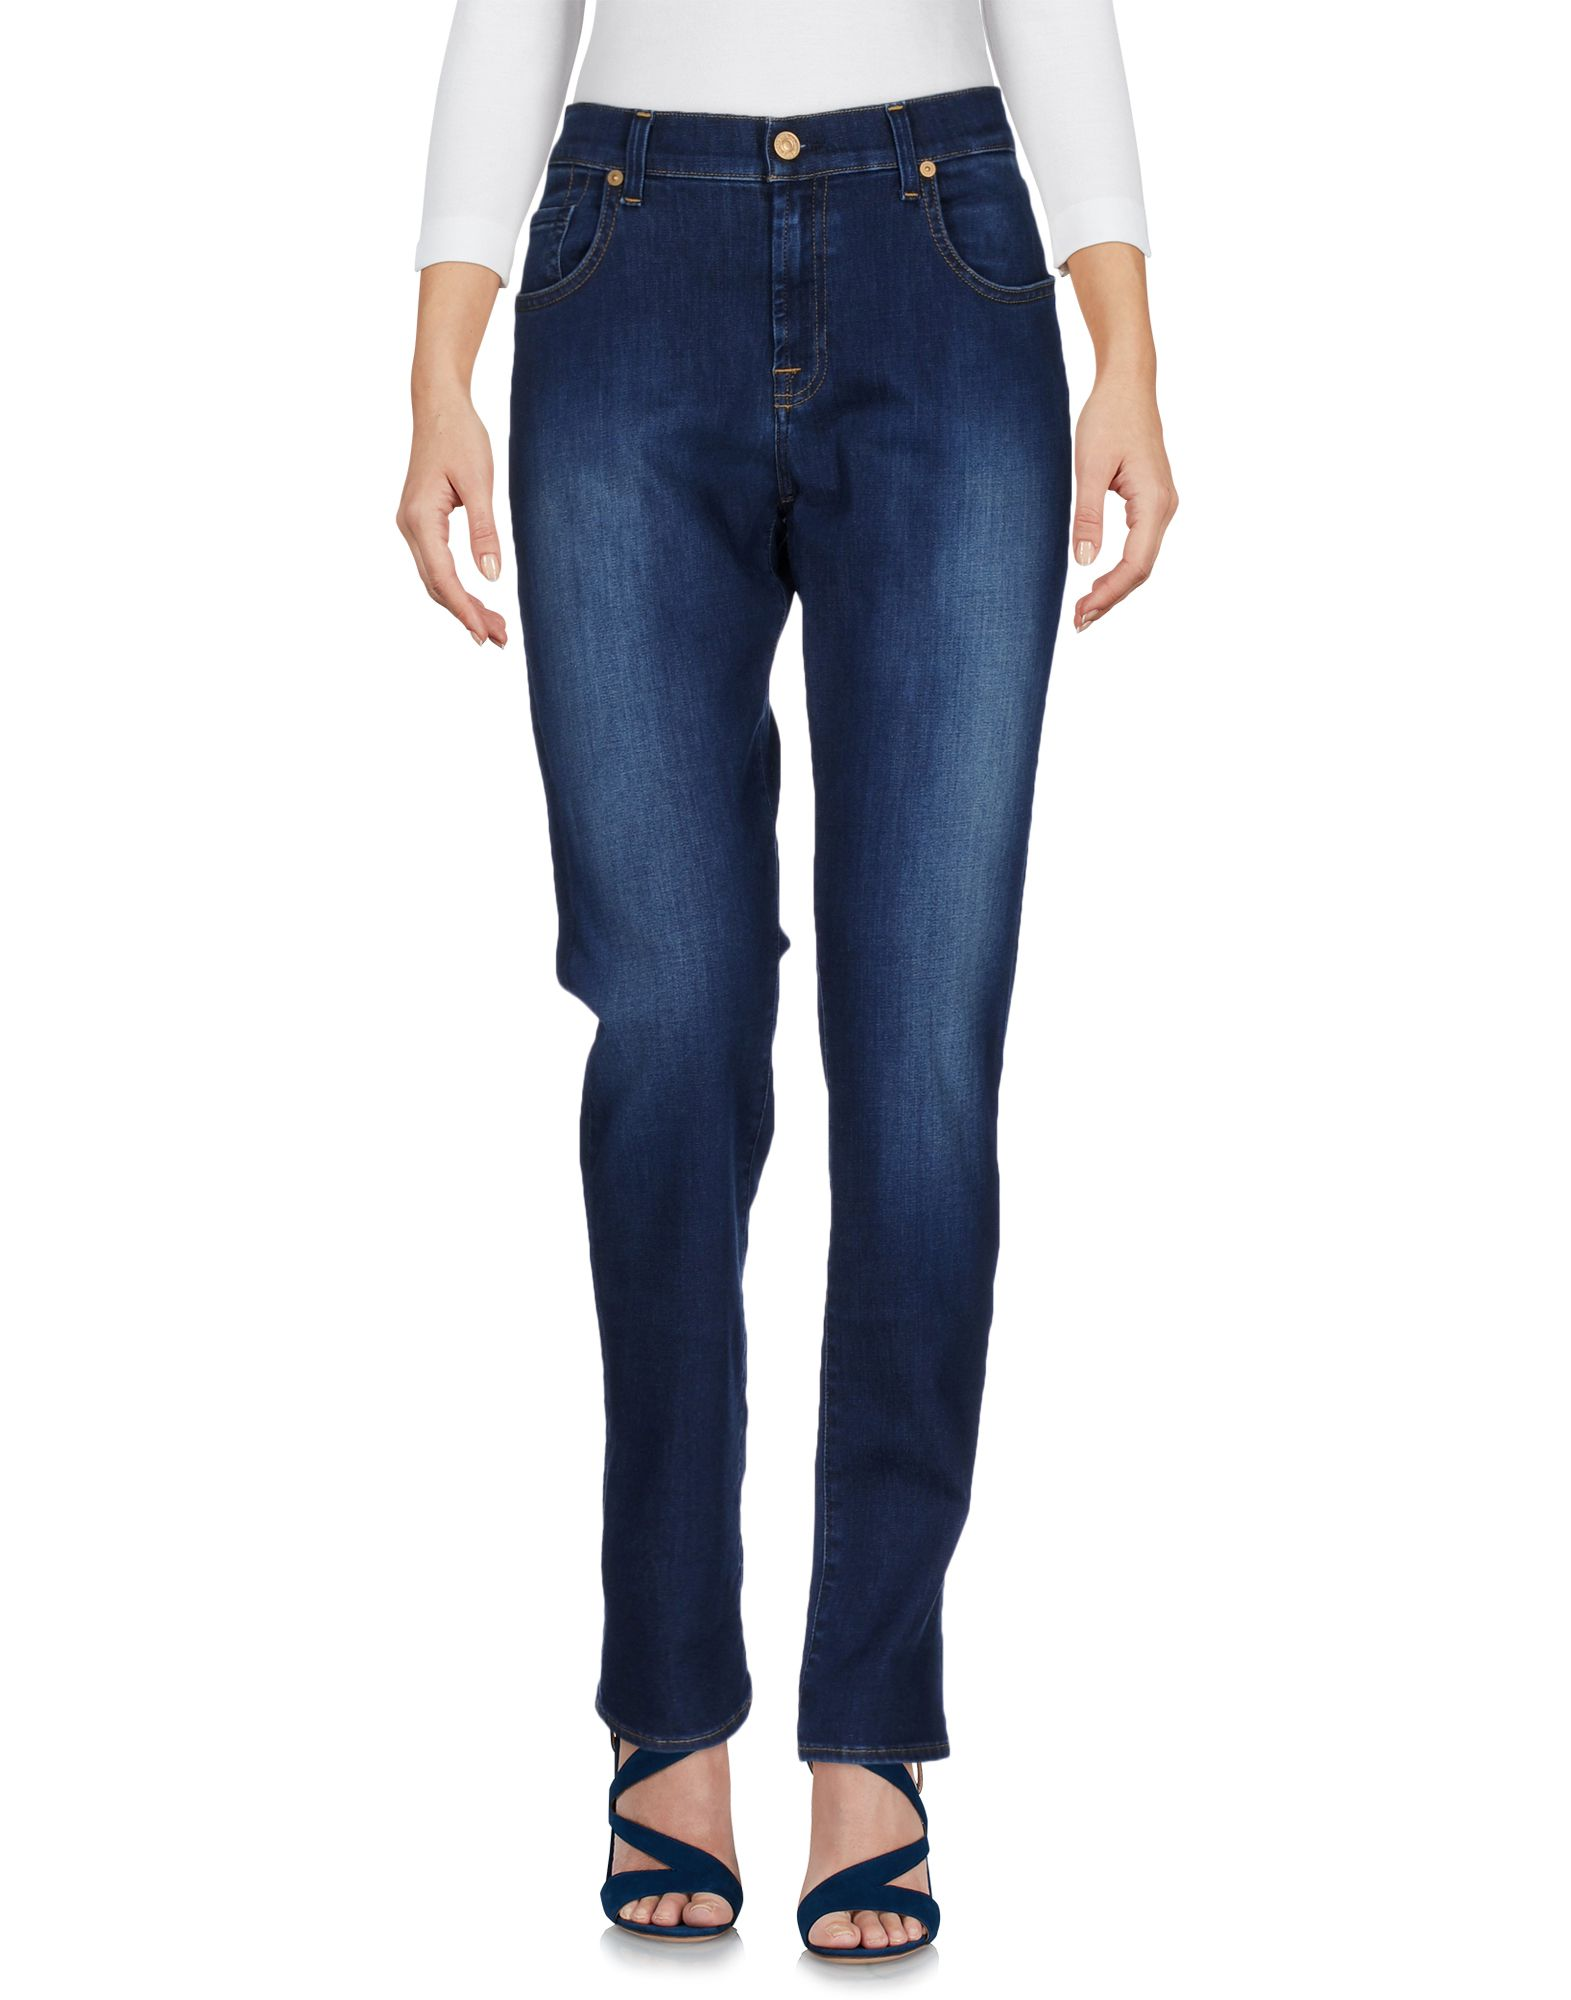 7 FOR ALL MANKIND Damen Jeanshose Farbe Blau Größe 4